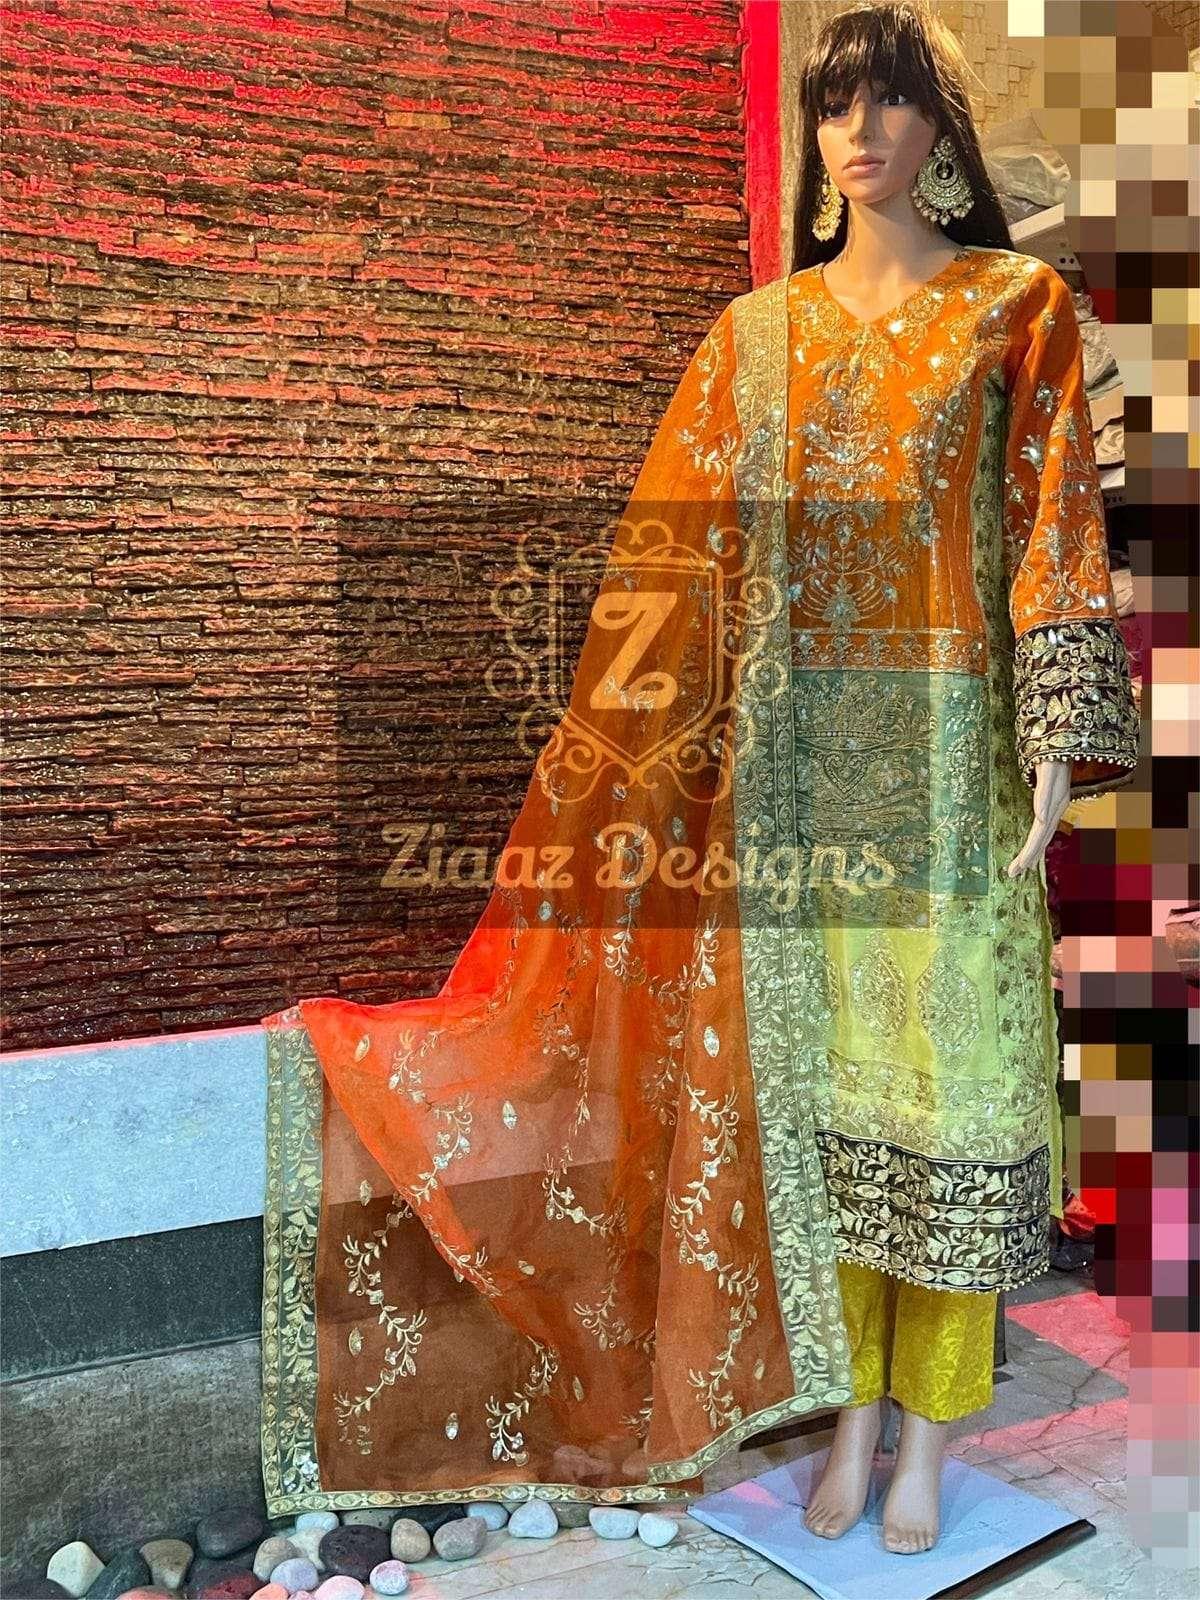 Ziaaz z series organza pakistani suit